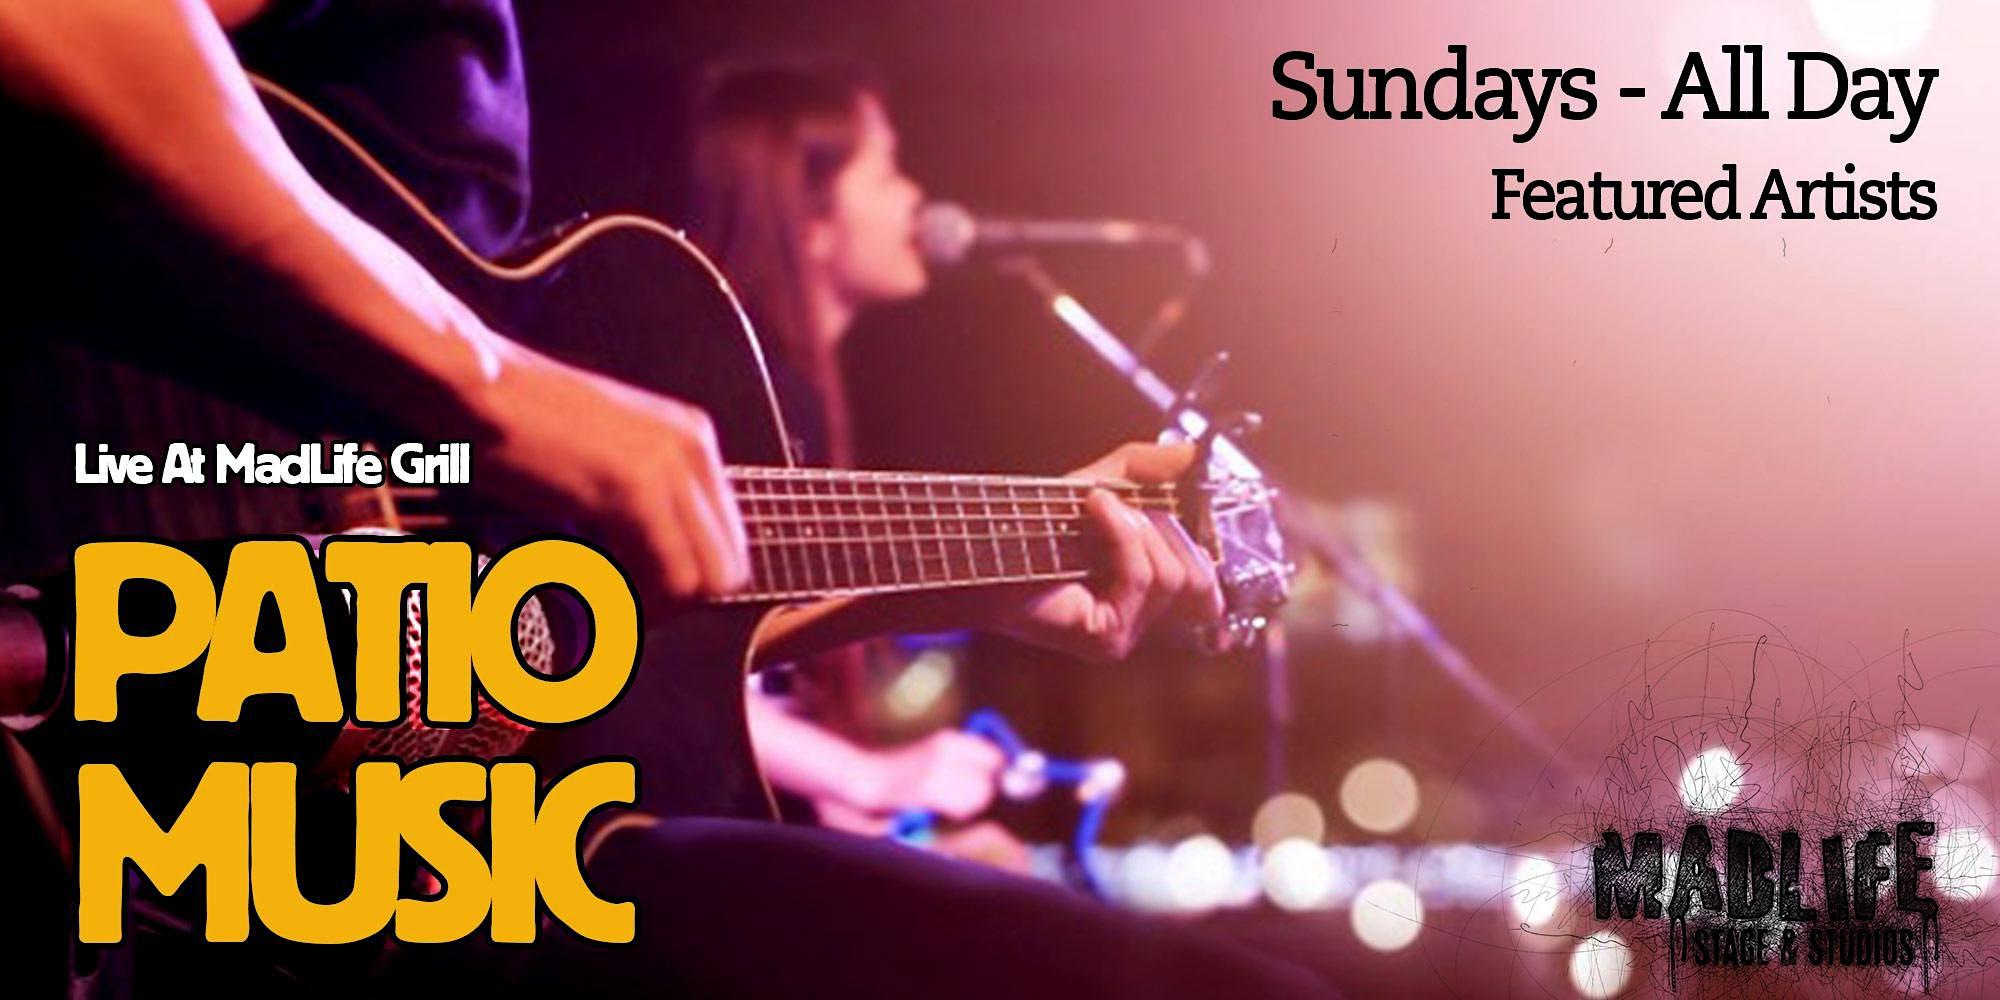 SUN Patio Greg Shaddix & Dallas McGee, Roger Wilson, & Mark Cook Trio